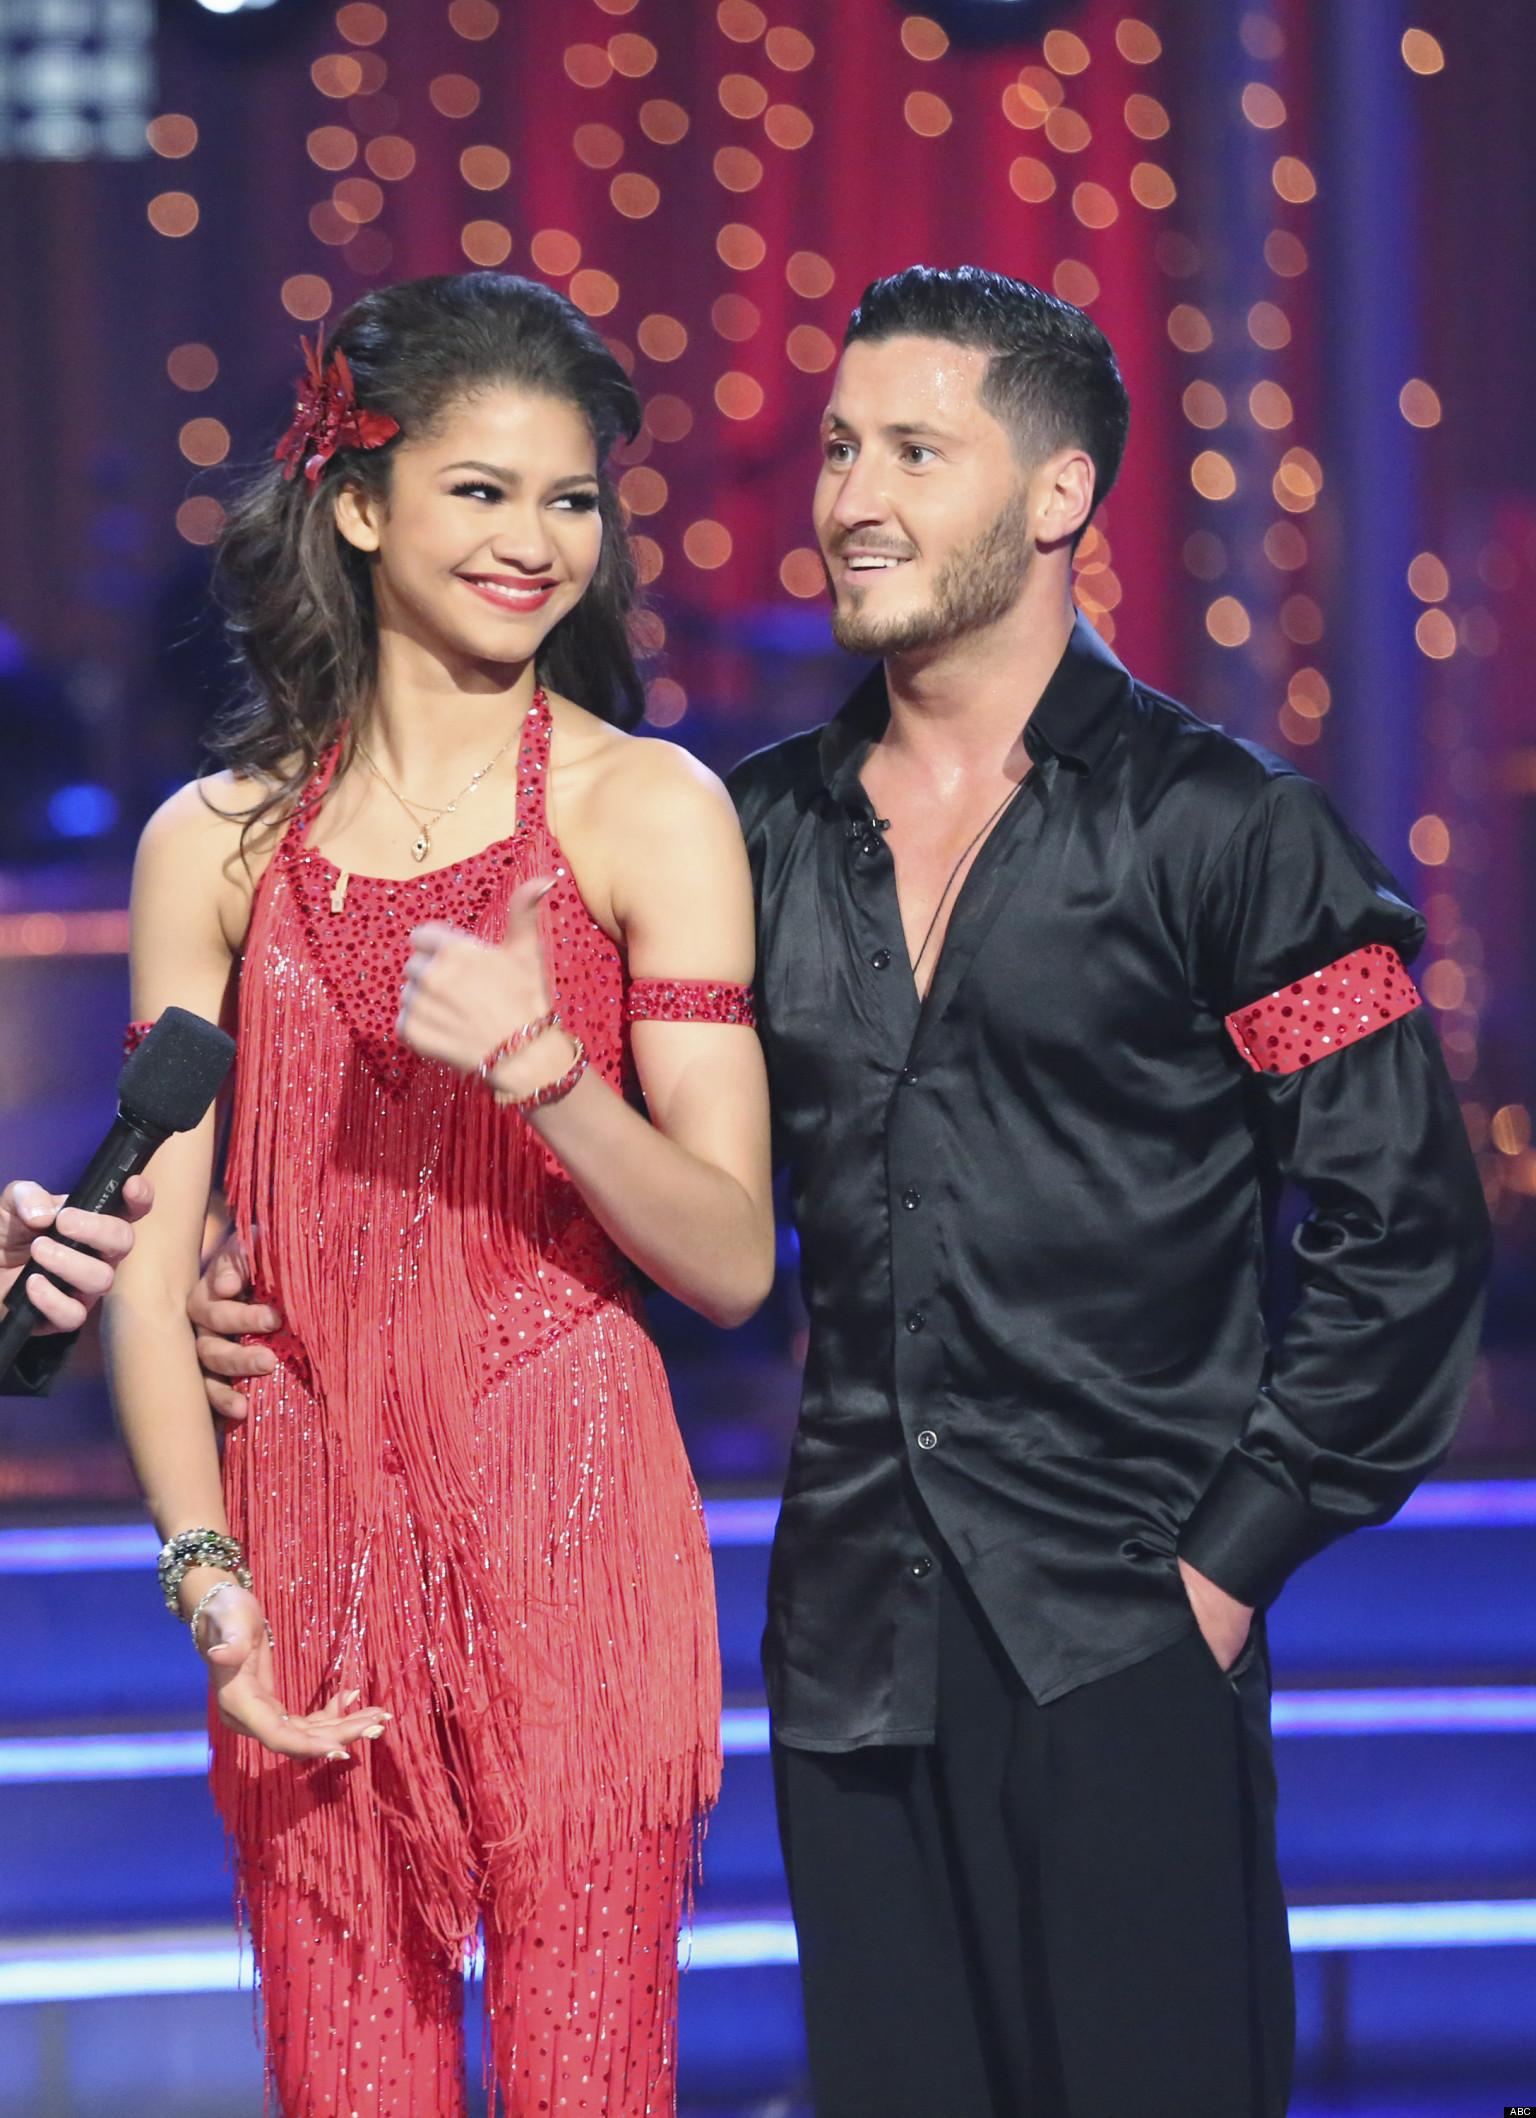 Zendaya Dress On Dancing With The Stars O-zendaya-dwts-facebook jpgZendaya Dancing With The Stars Dress